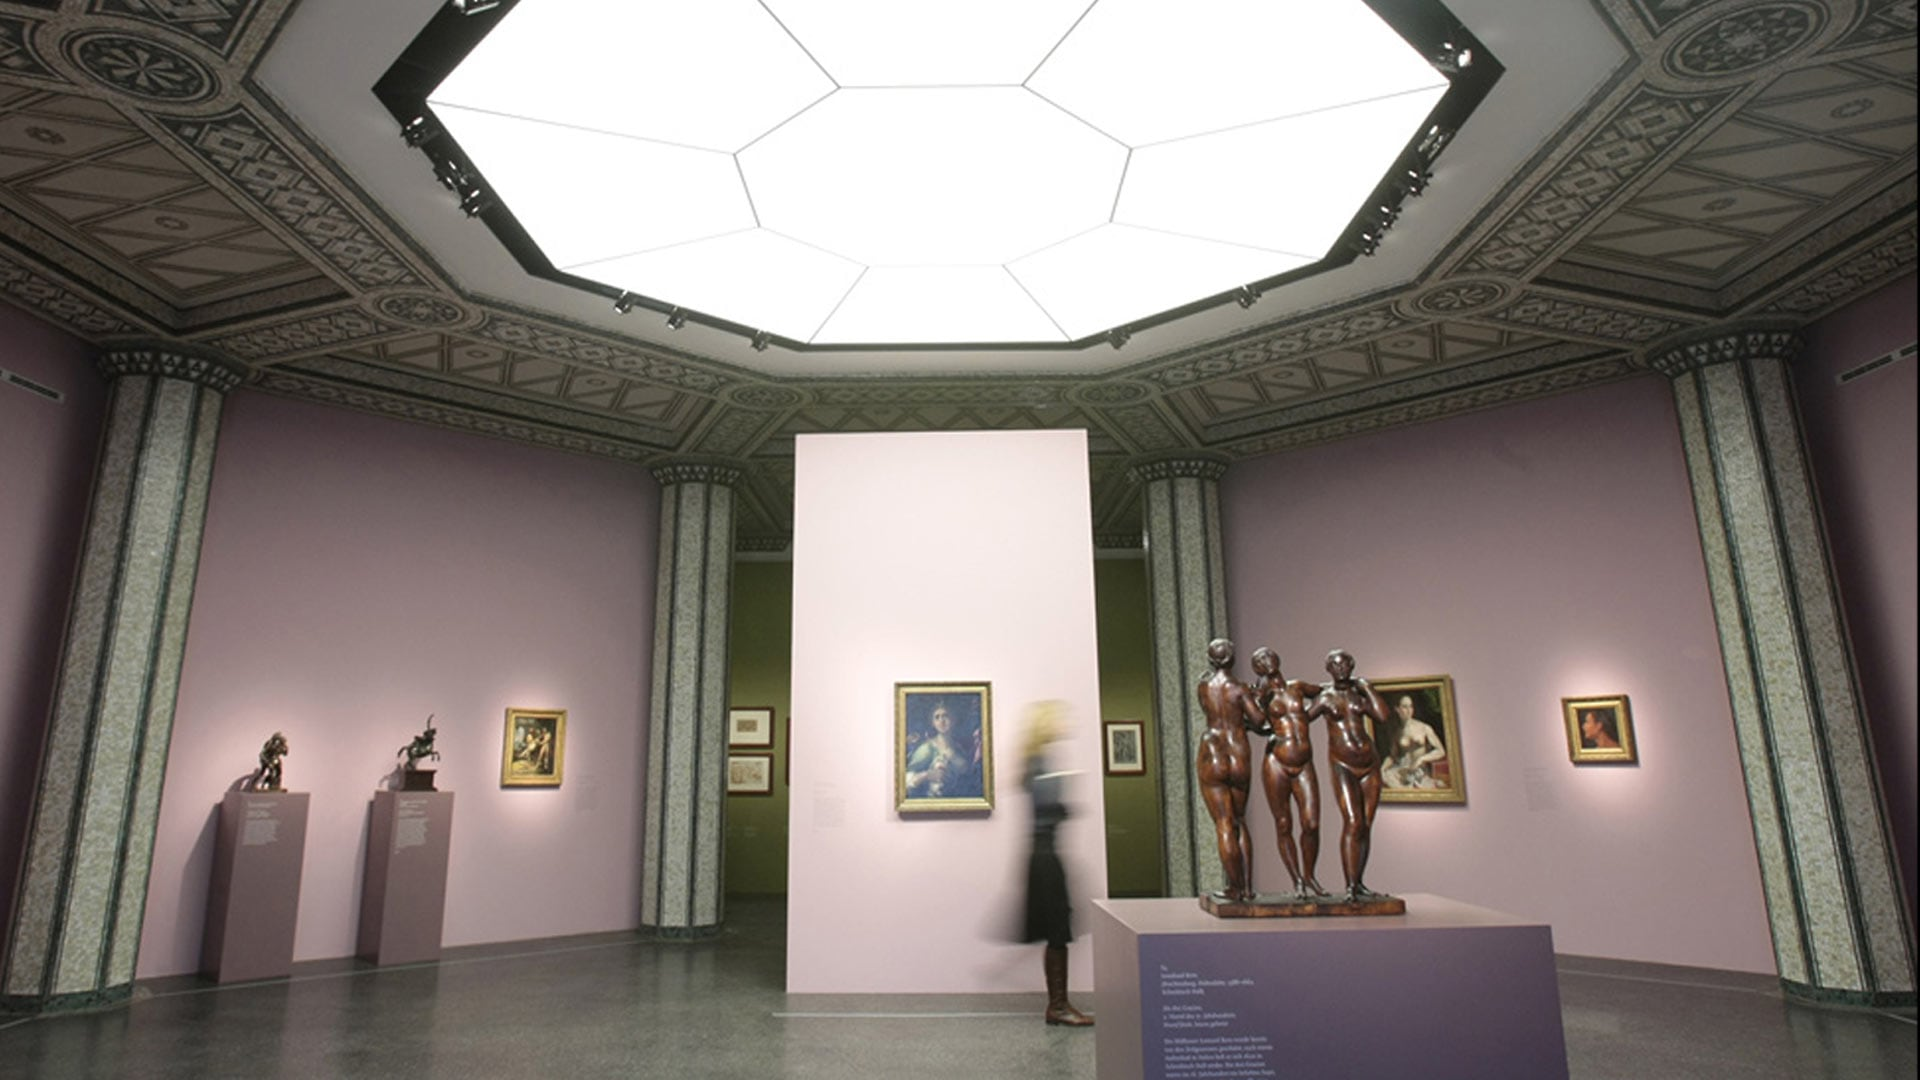 Bucerius Museum, Kunstforum / Ausstellung